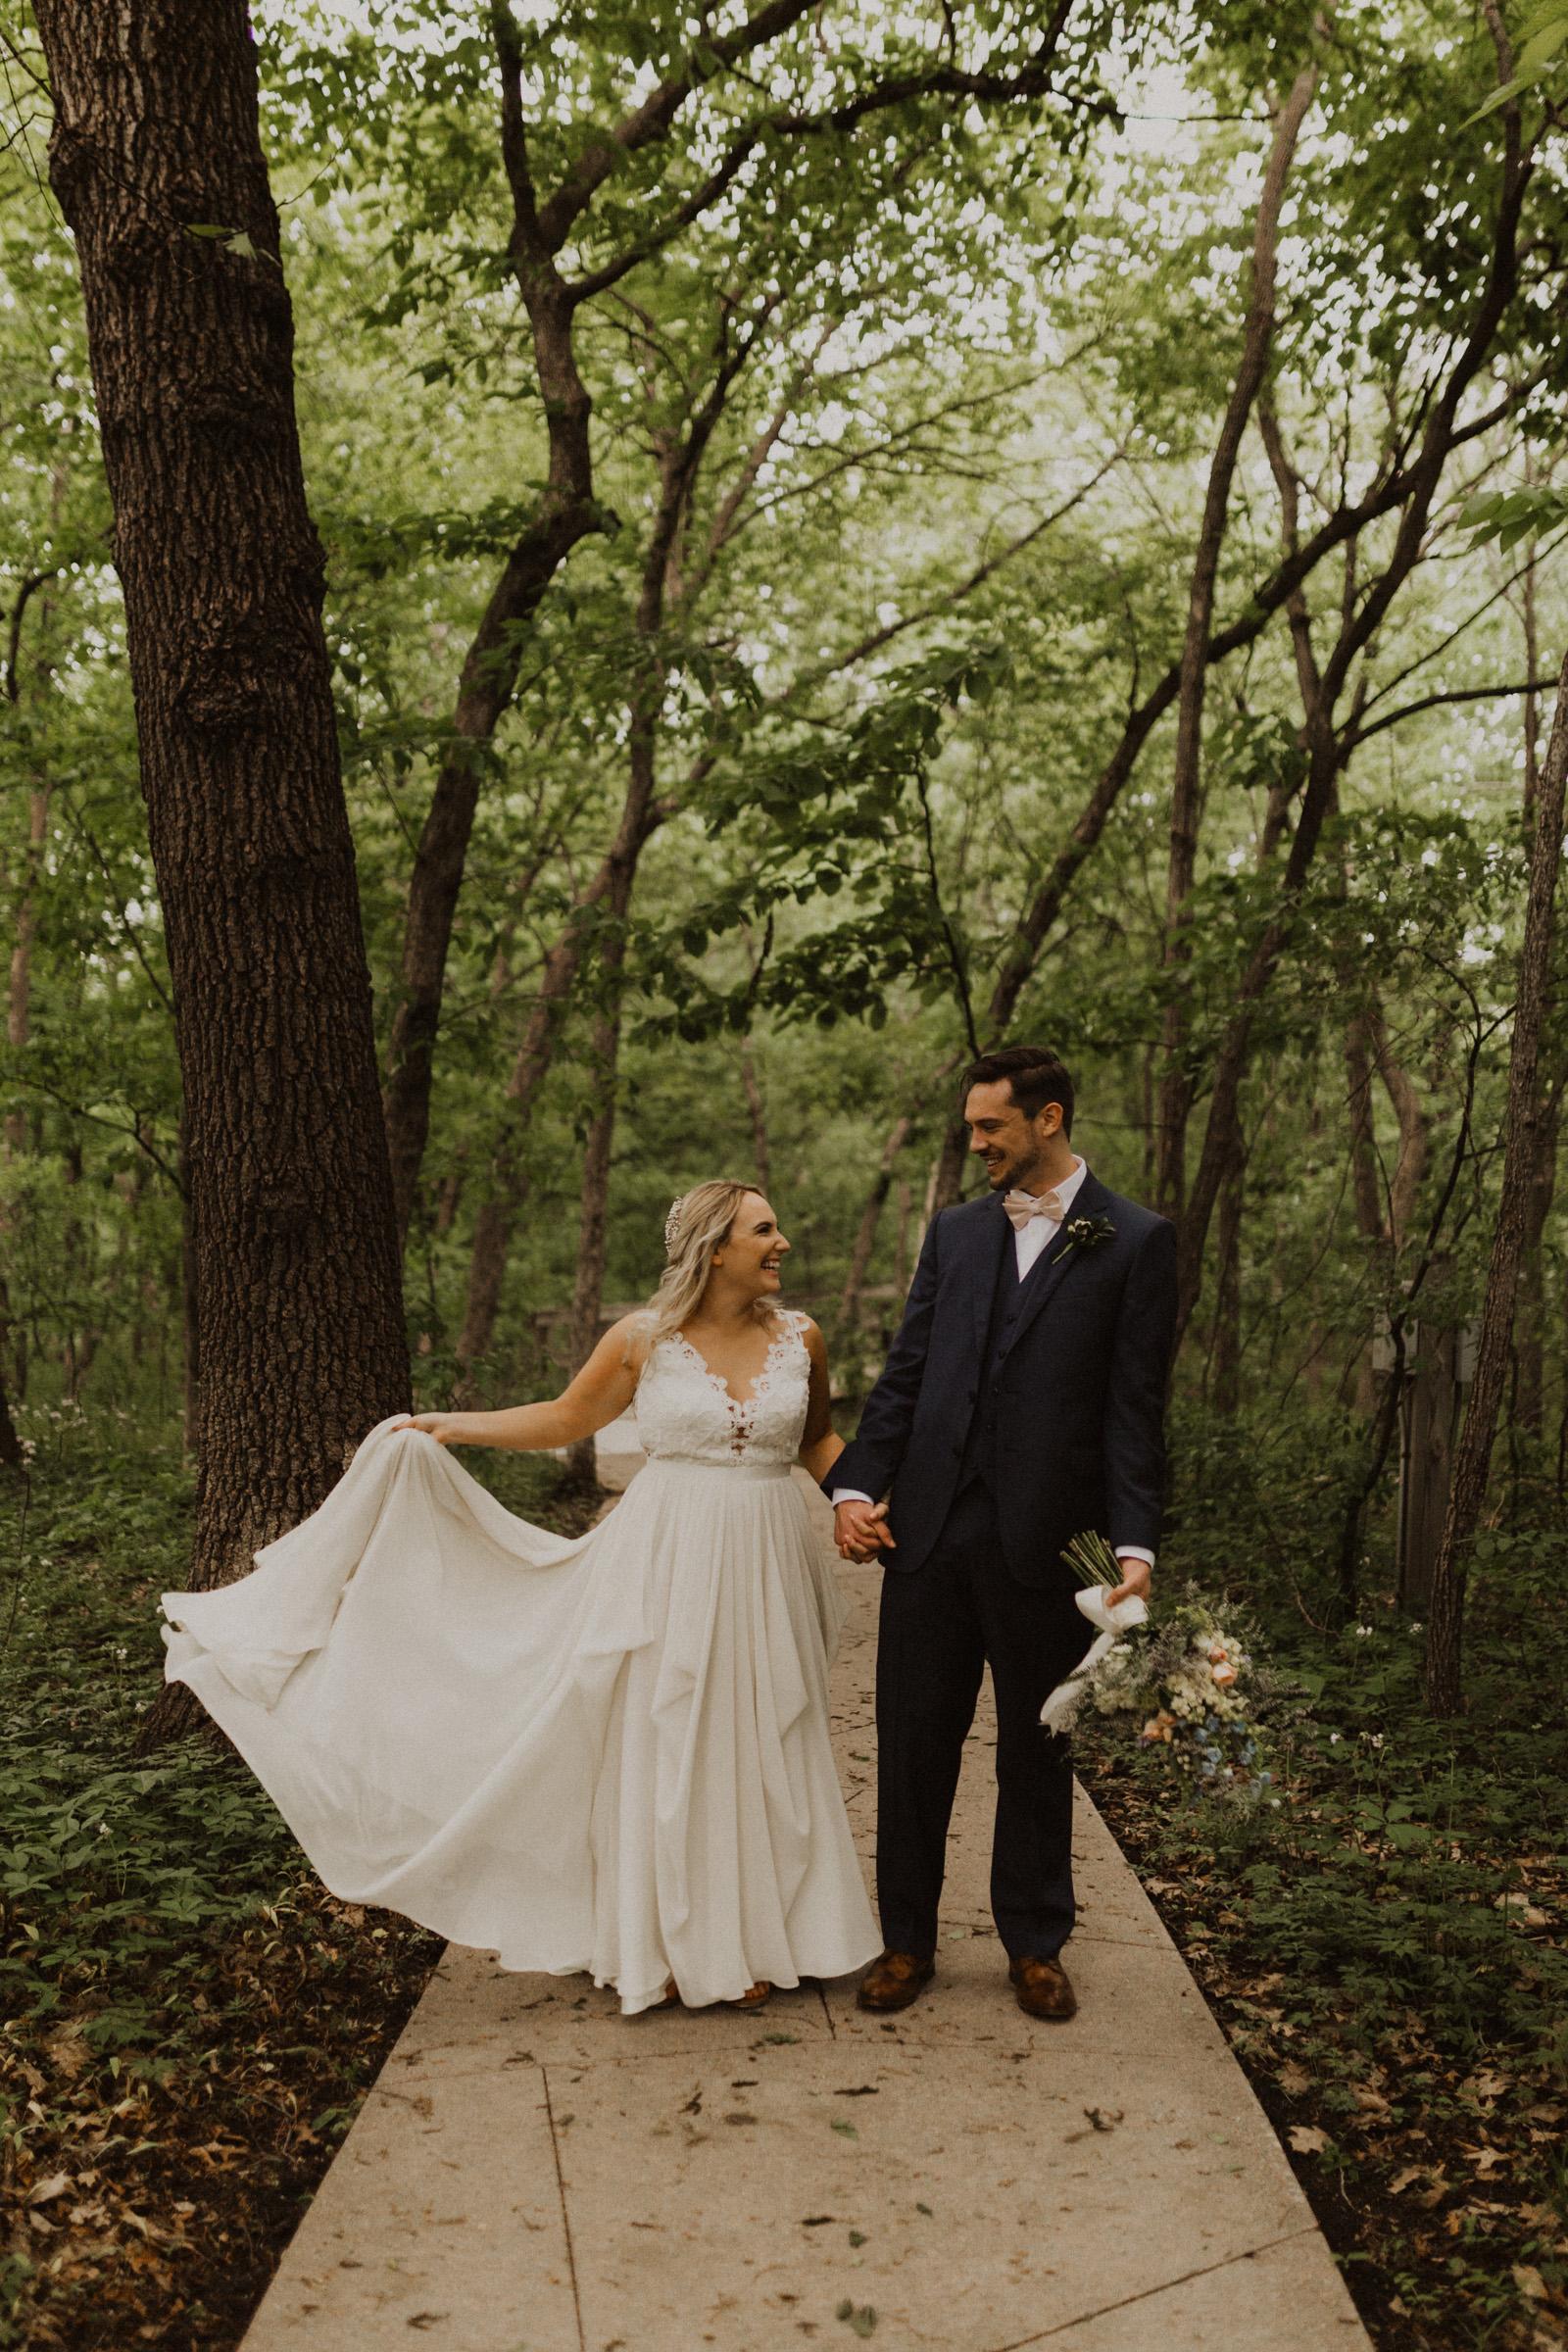 alyssa barletter photography nelson wedding nebraska city lied lodge morton barn spring wedding photographer-16.jpg